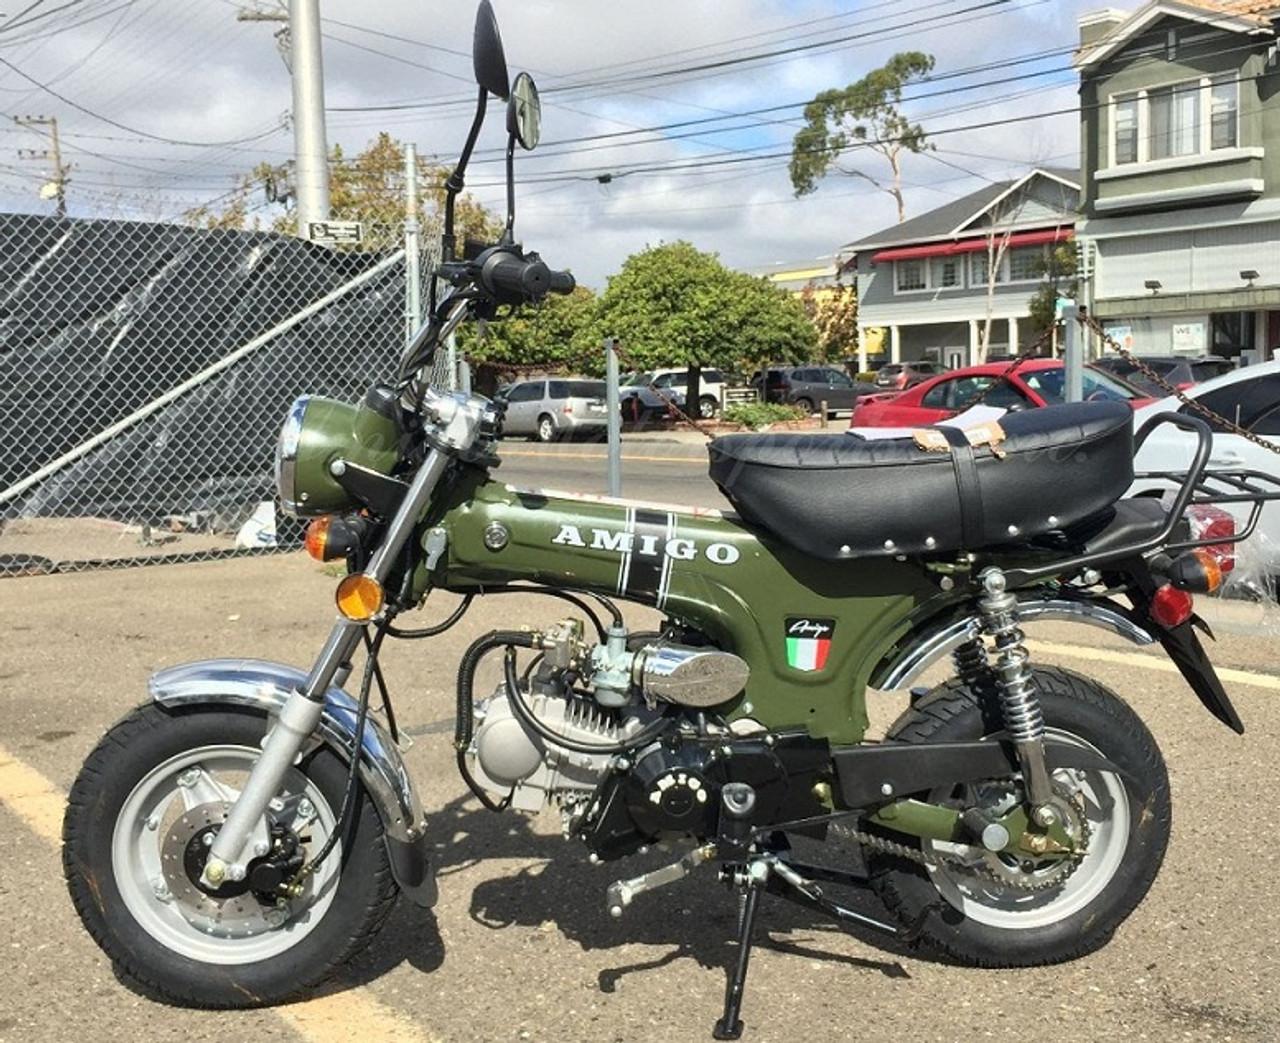 New Amigo Rocky-125 Scooter, Manual 4-Speed